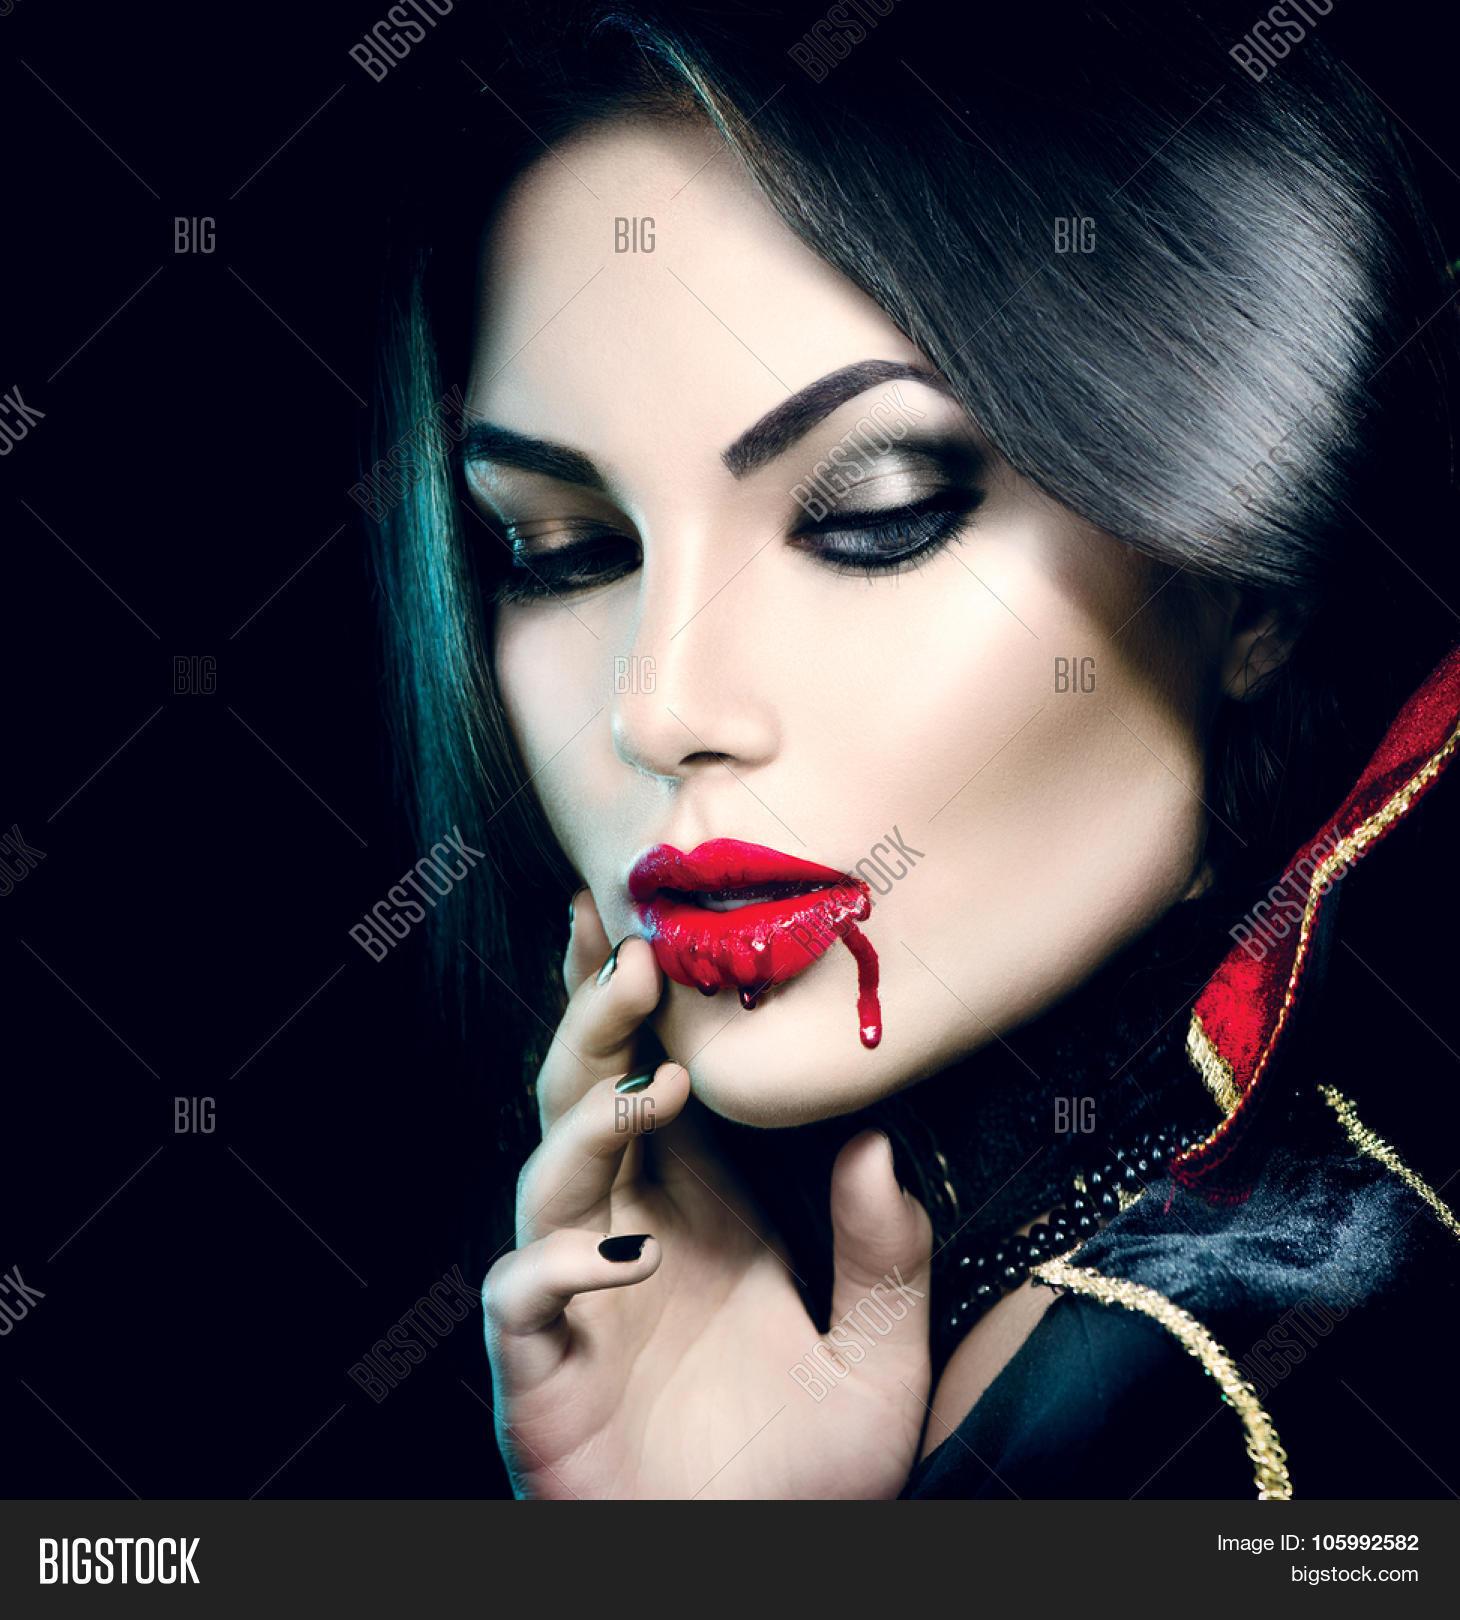 Erotic vampire costume